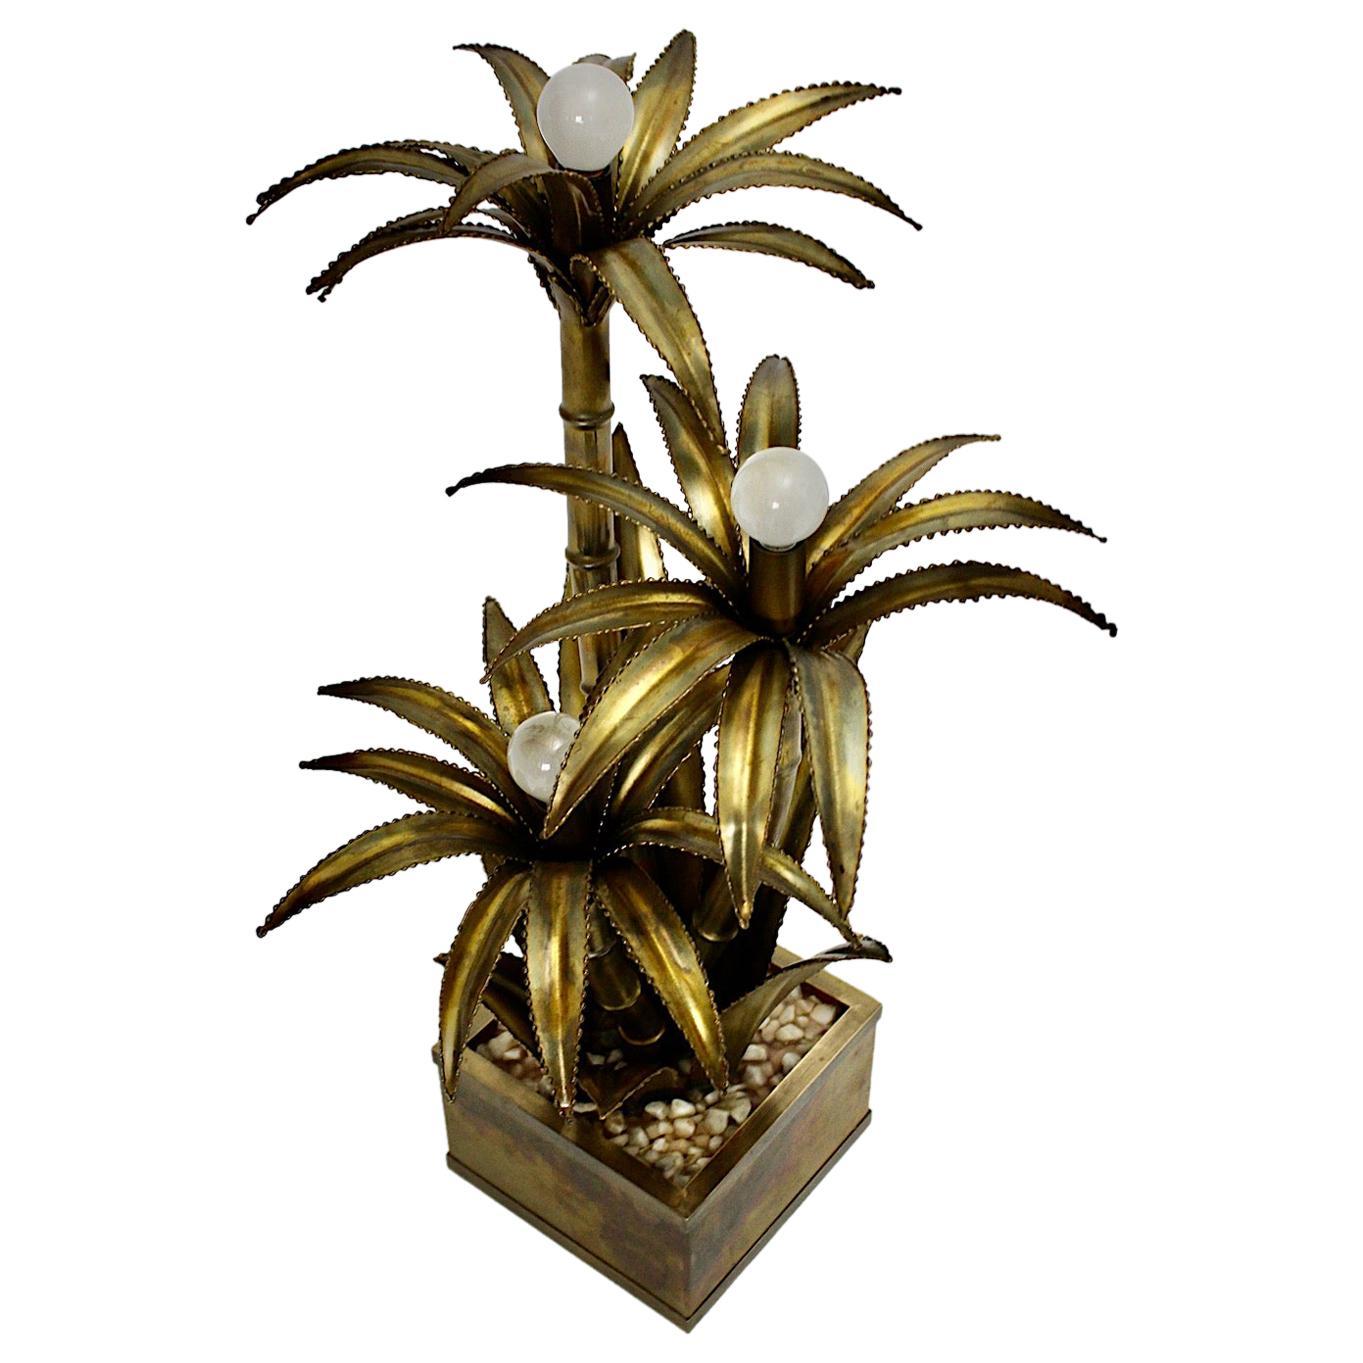 Maison Jansen Vintage Brass Palm Tree Table Lamp, 1970s, France